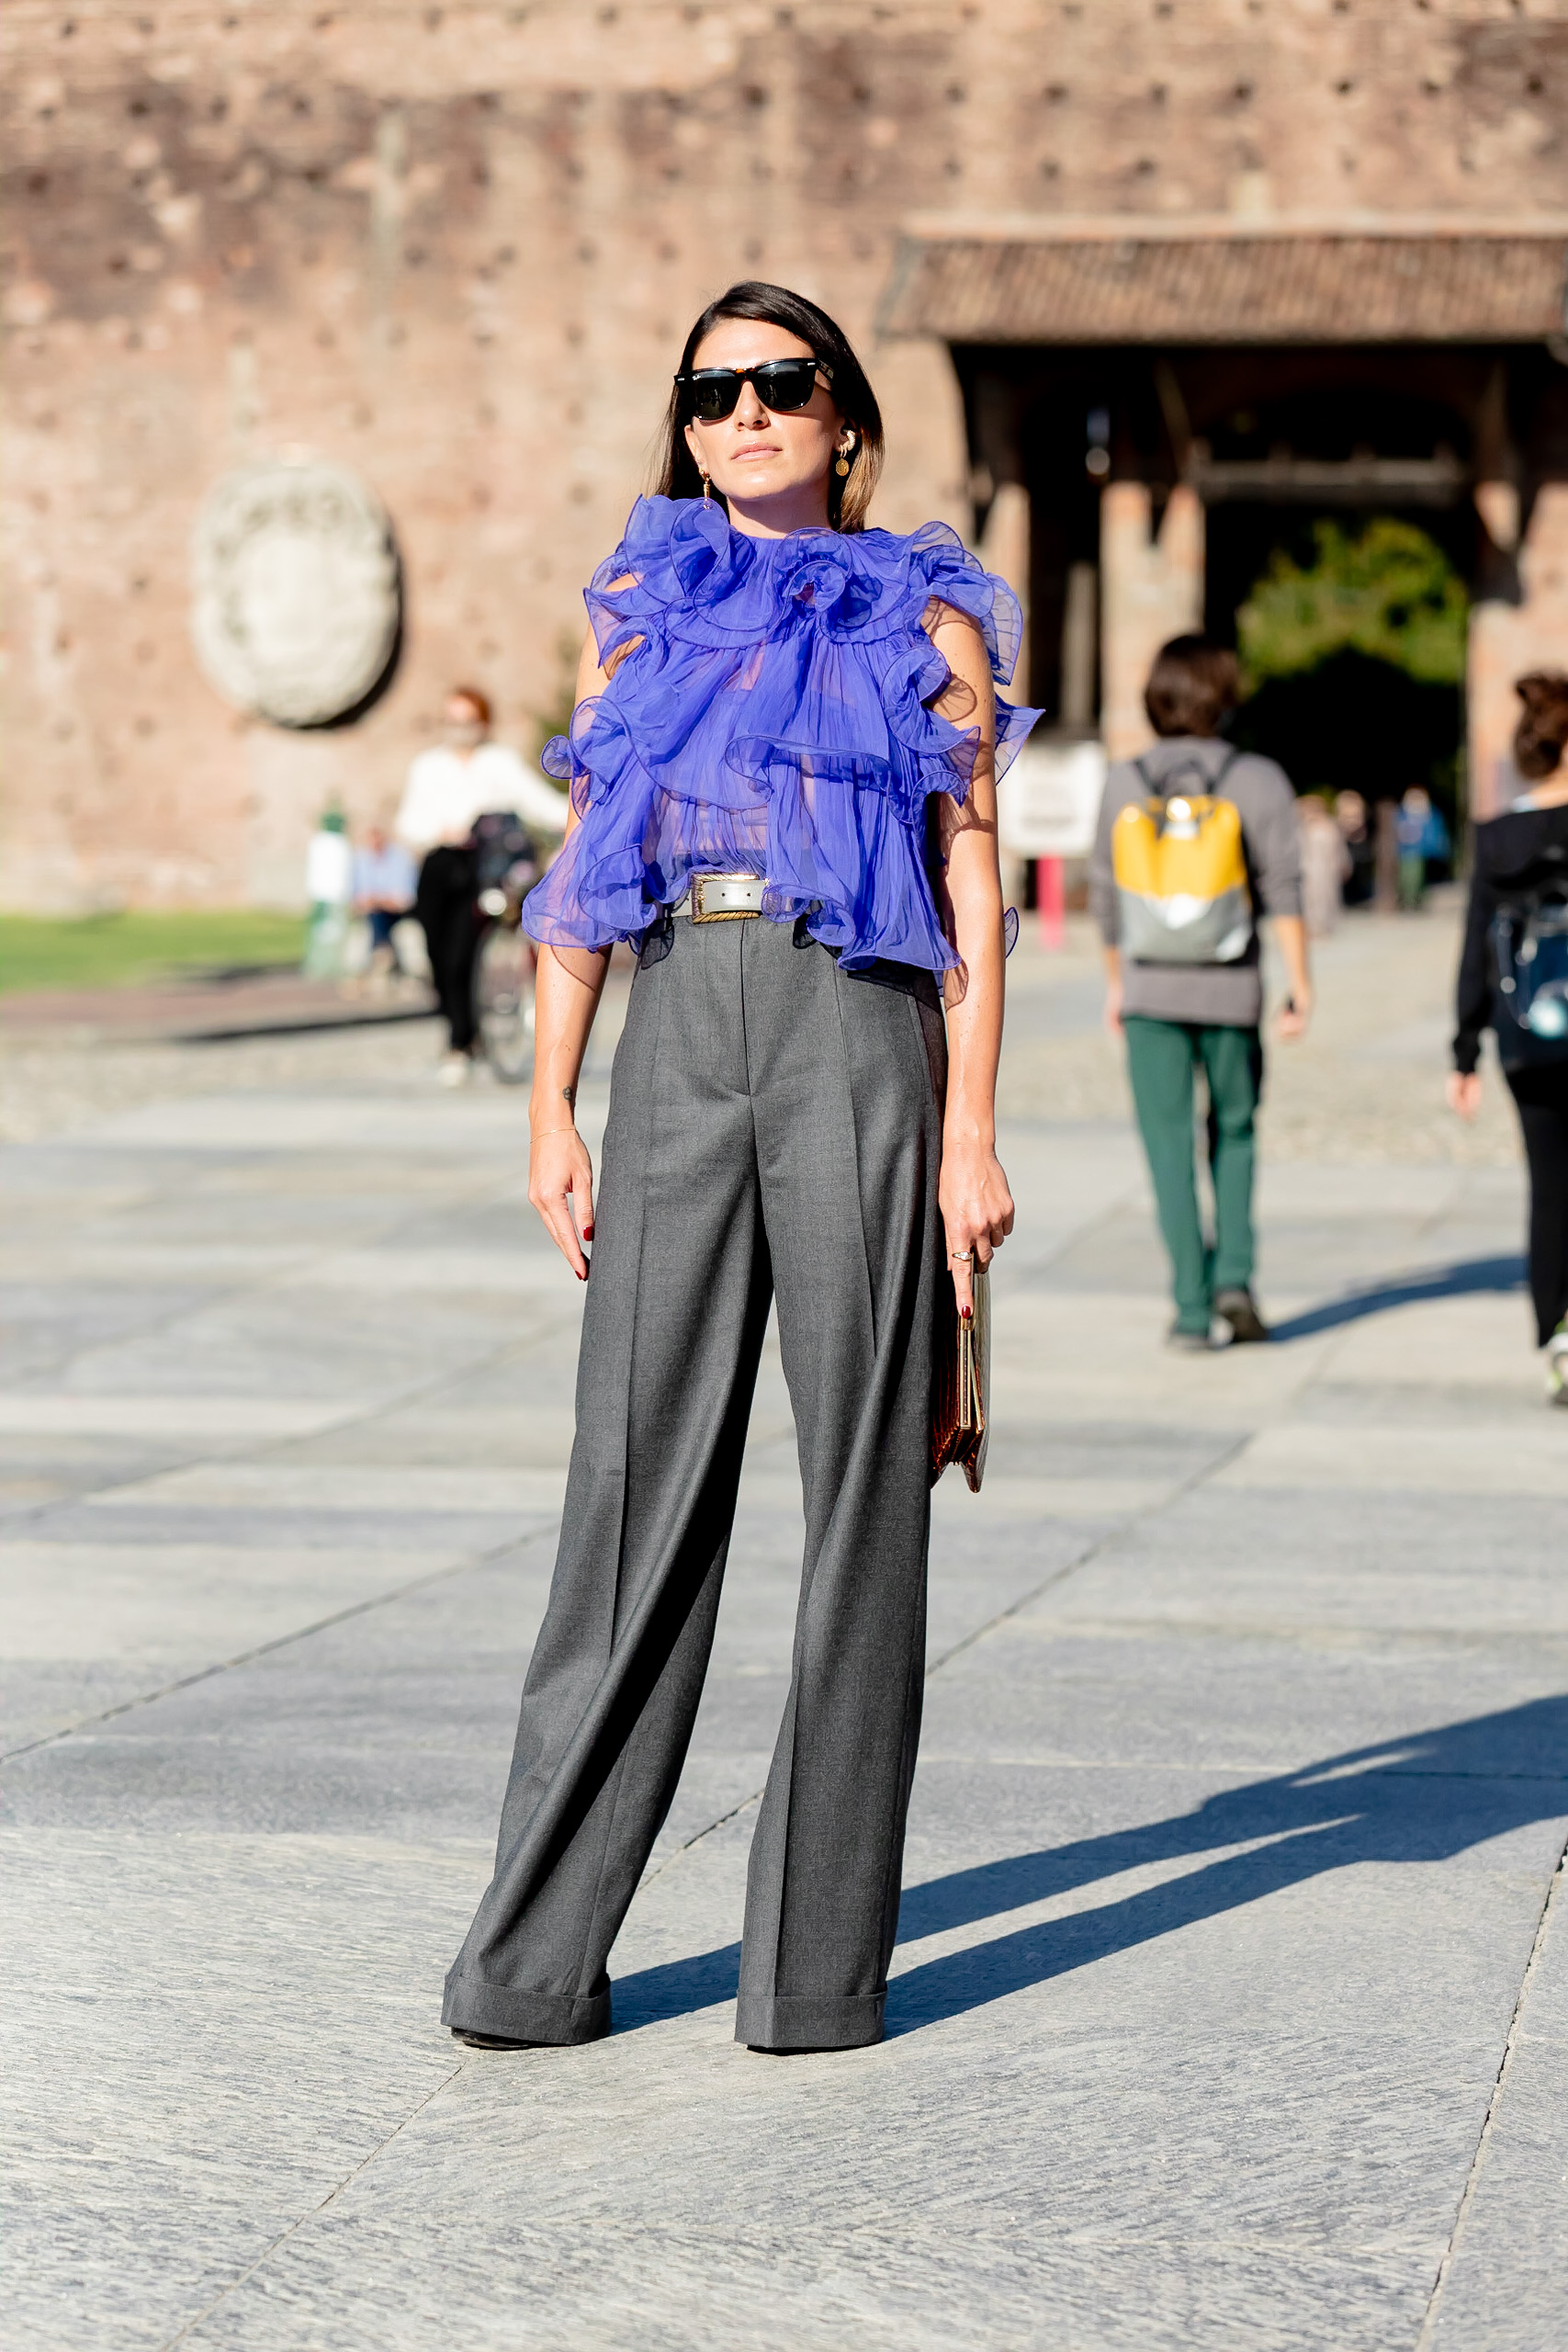 Milan Spring 2021 Day 1 Street Style by Nick Leuze Photos